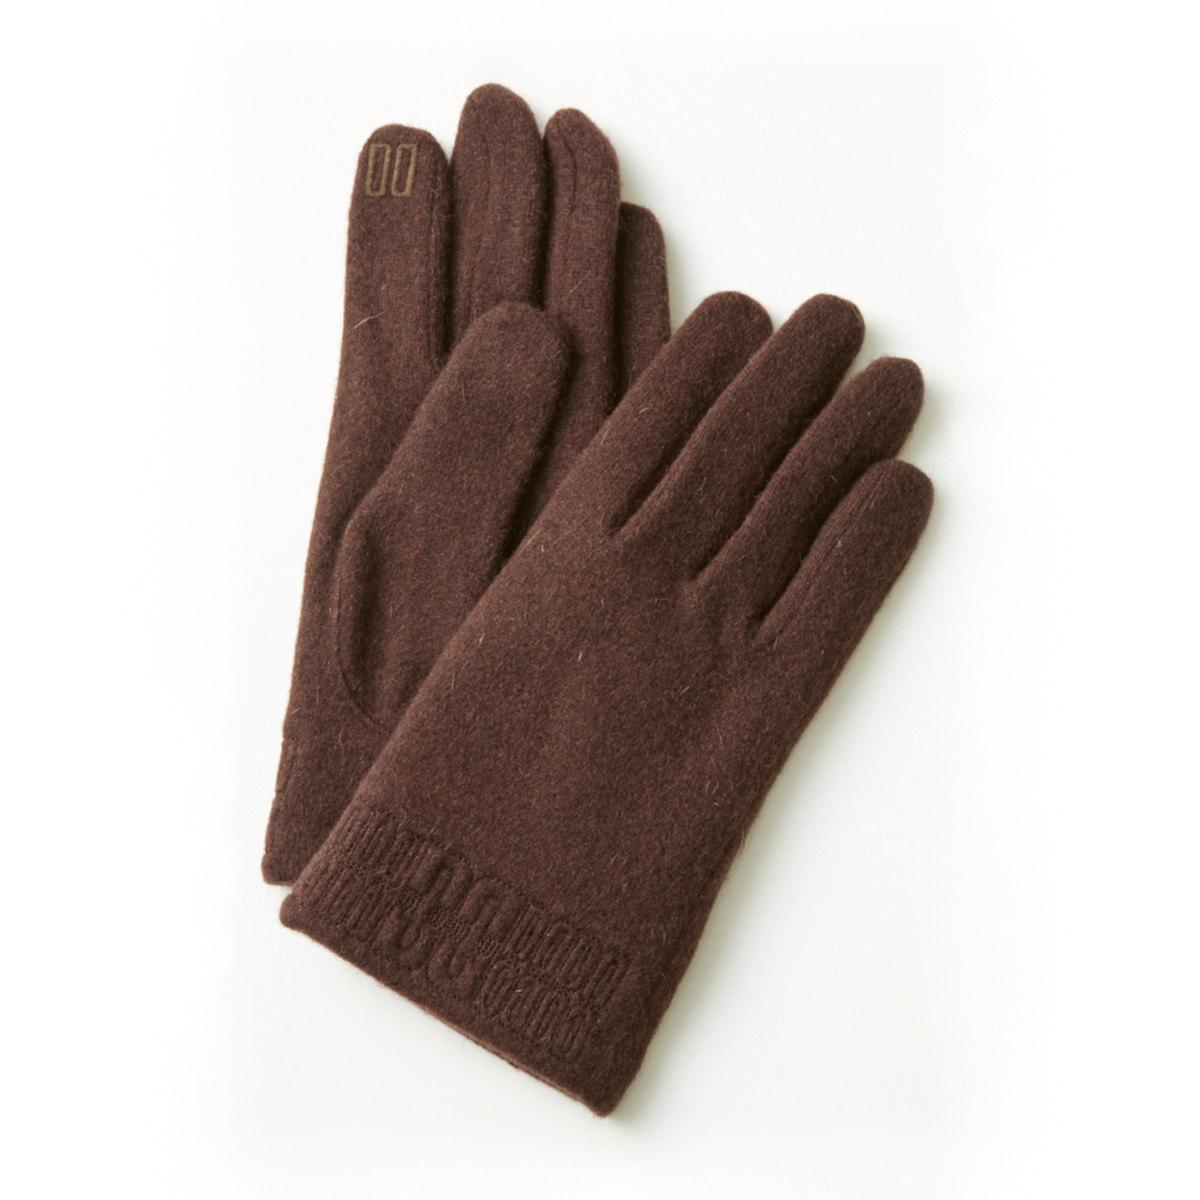 DAKS ウール混ジャージ メンズ手袋 裾DD柄刺繍 スマホ タッチパネル対応 日本製 23〜24cm(M) 全3色